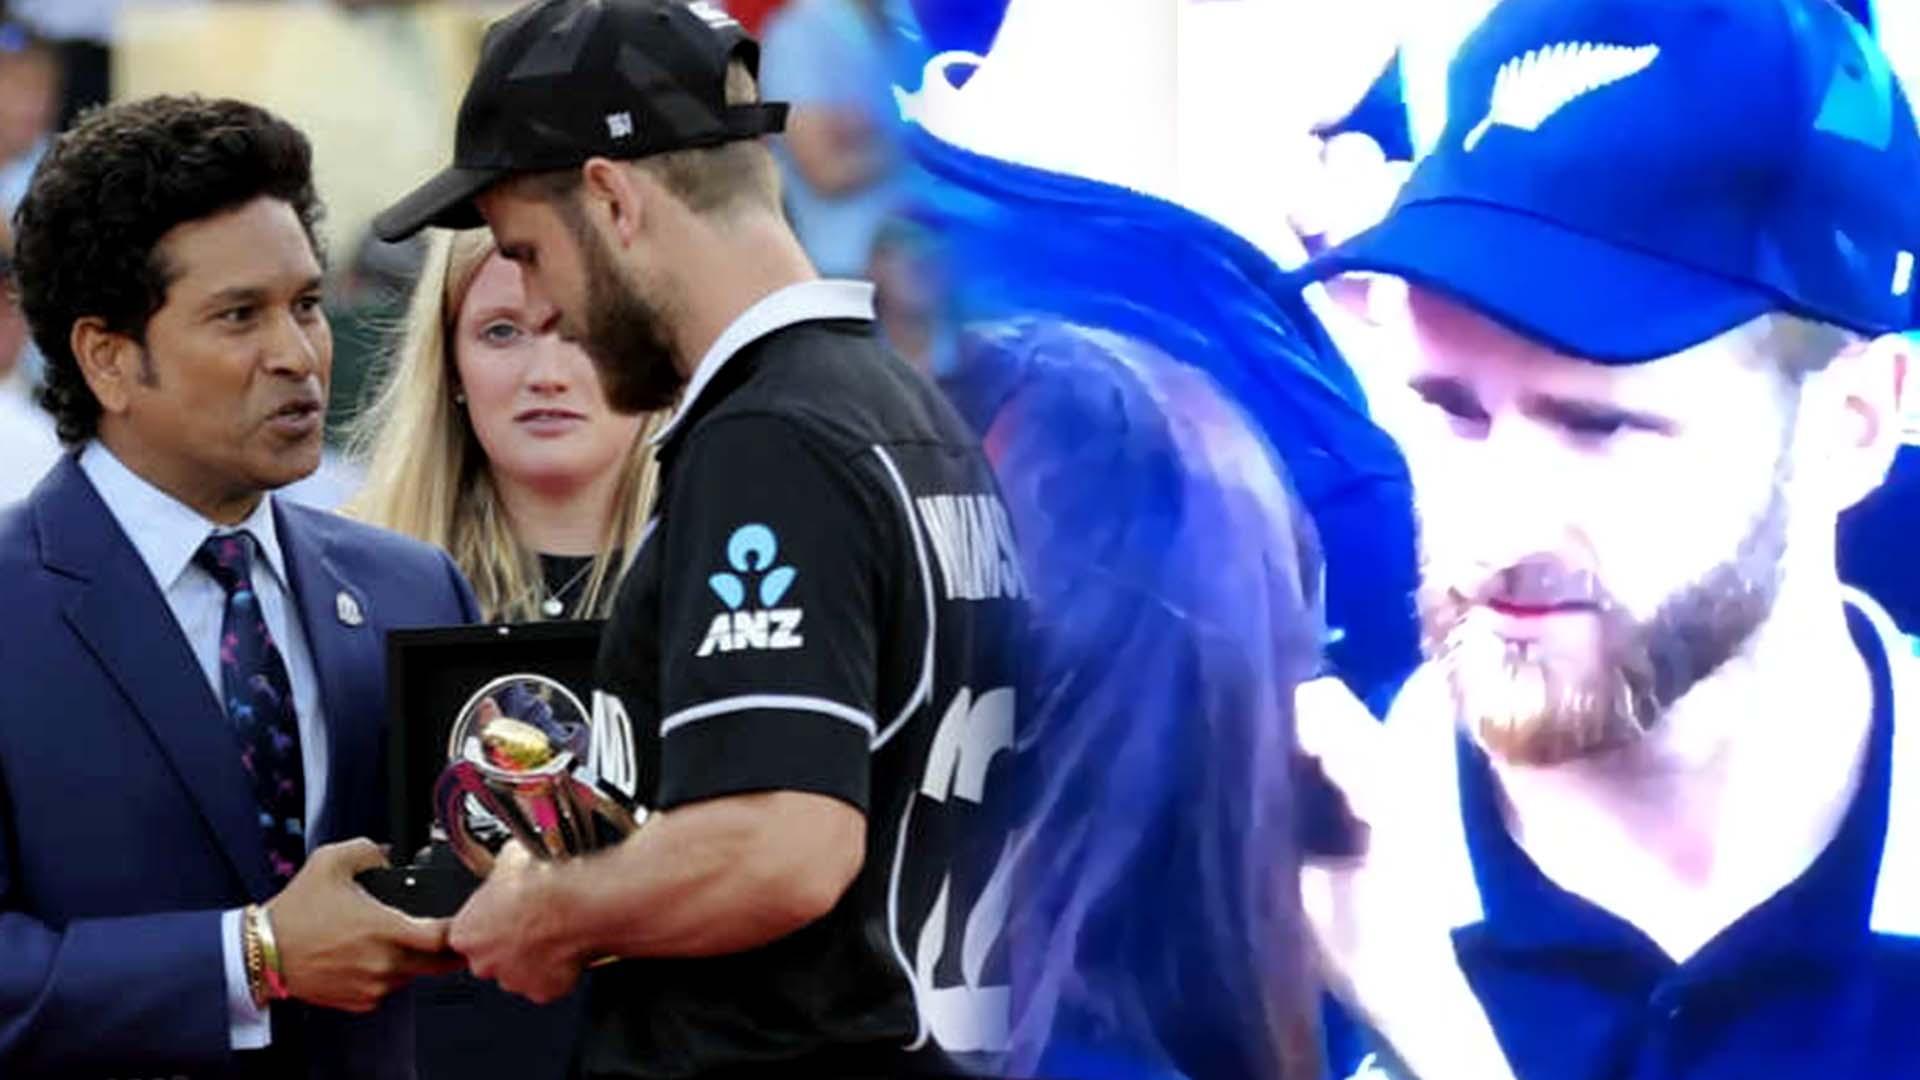 WORLD CUP 2019 FINALS : NZ VS ENG | களத்திலேயே அதிர்ச்சி அடைந்த வில்லியம்சன்! ஏன் தெரியுமா?- வீடியோ